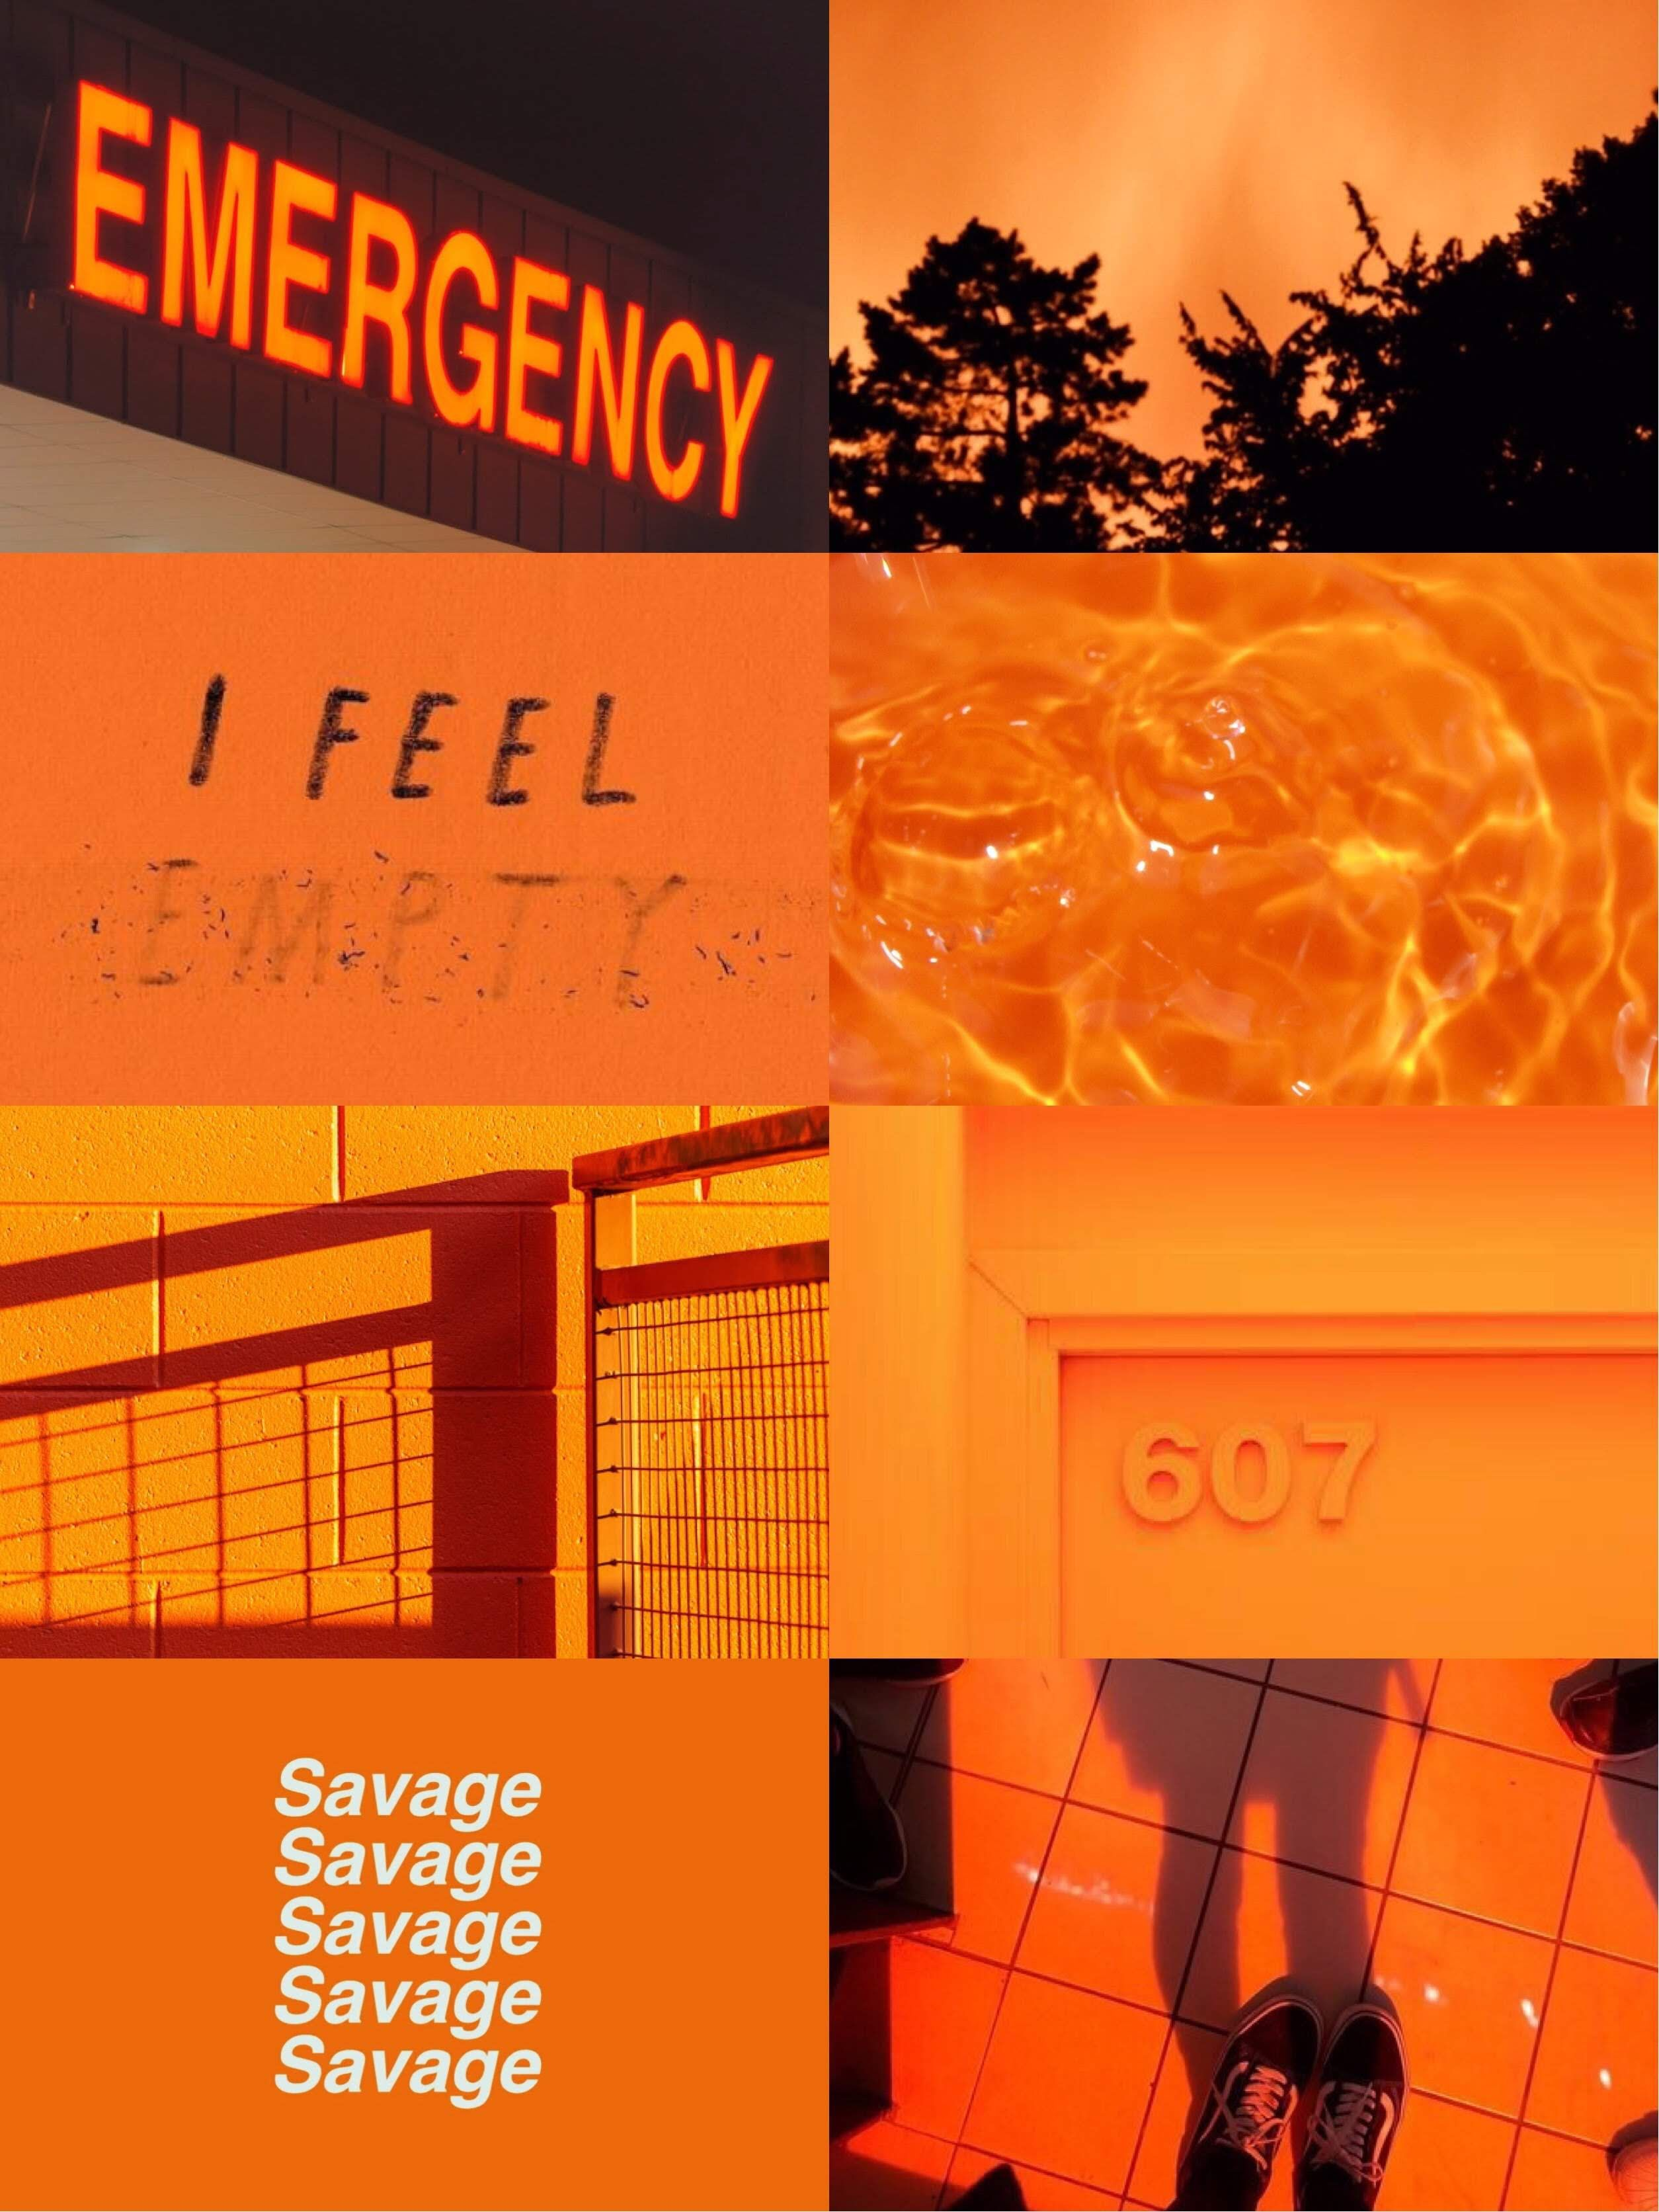 Fondo Aesthetic De Color Naranja Naranja Fondo Fondos De Pantalla De Iphone Fondos Para Fotos Tumblr